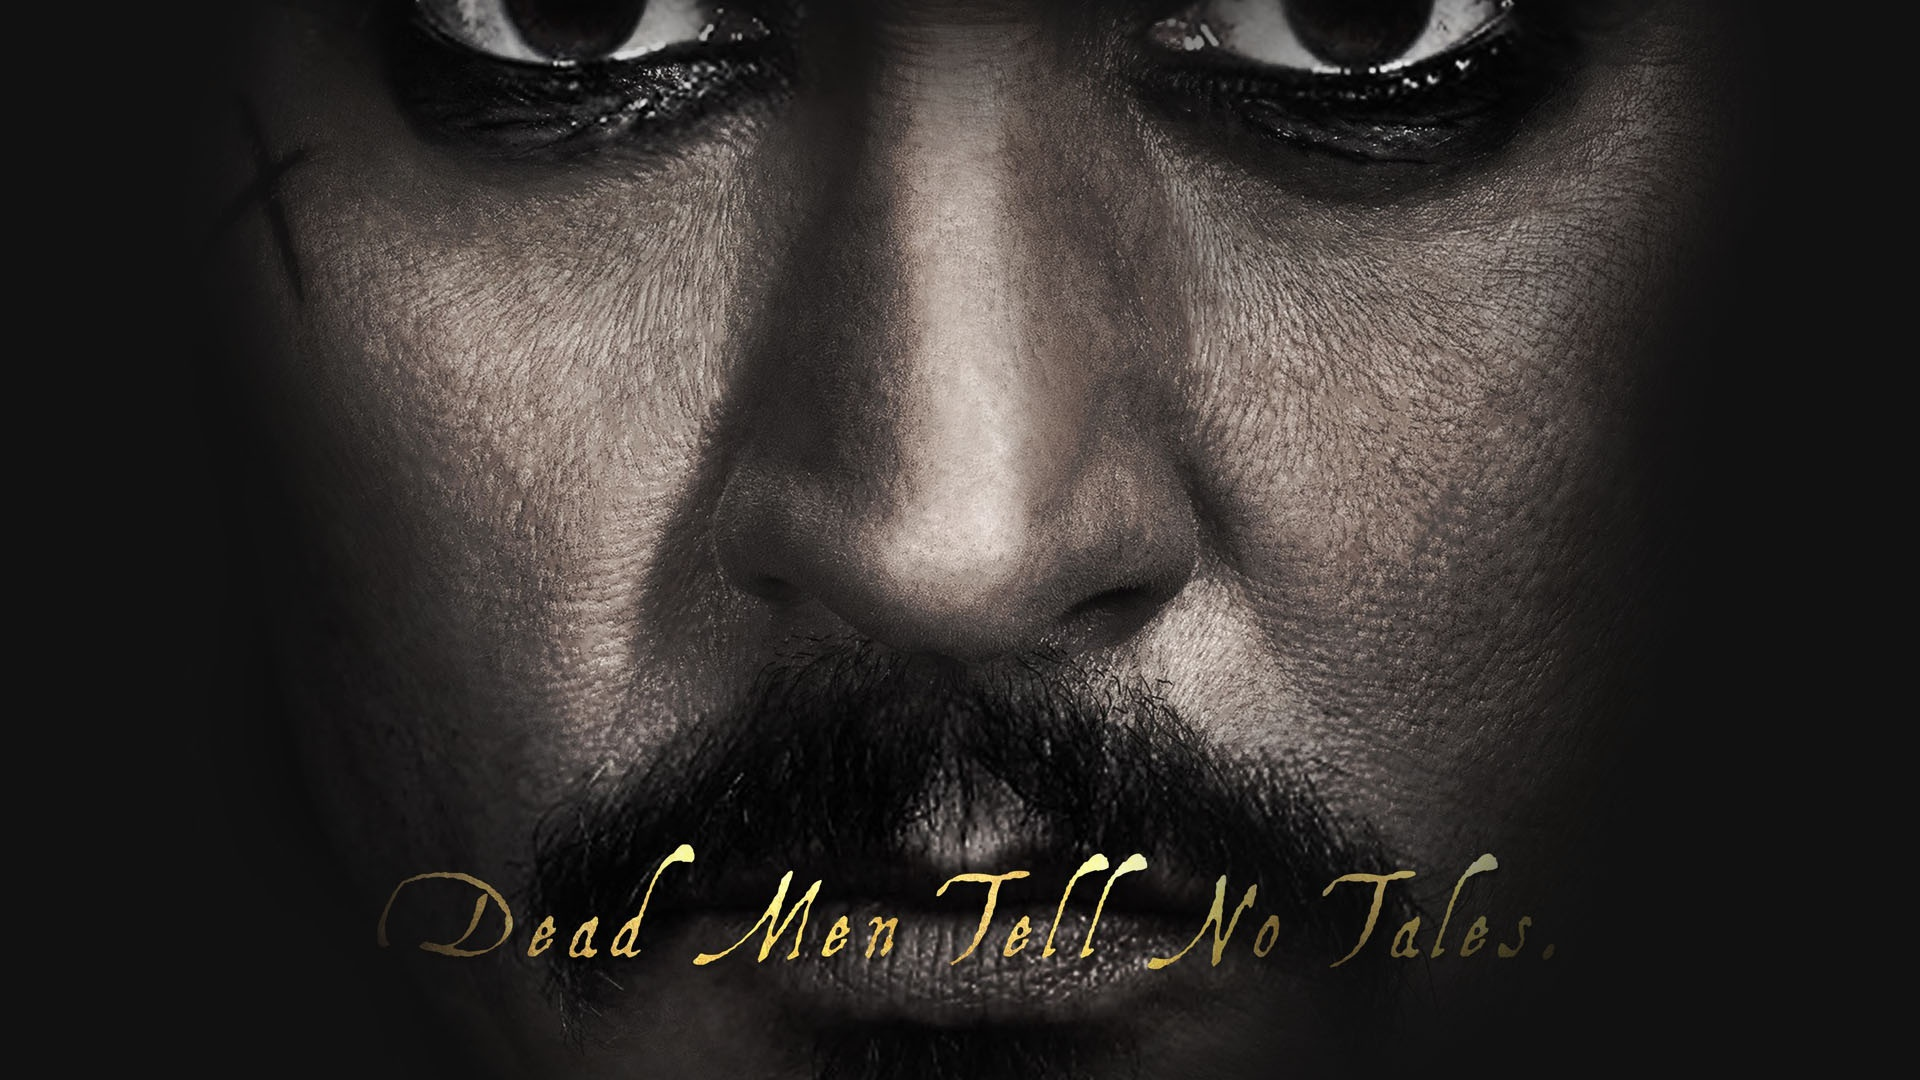 Dead Men Tell No Tales Wallpaper